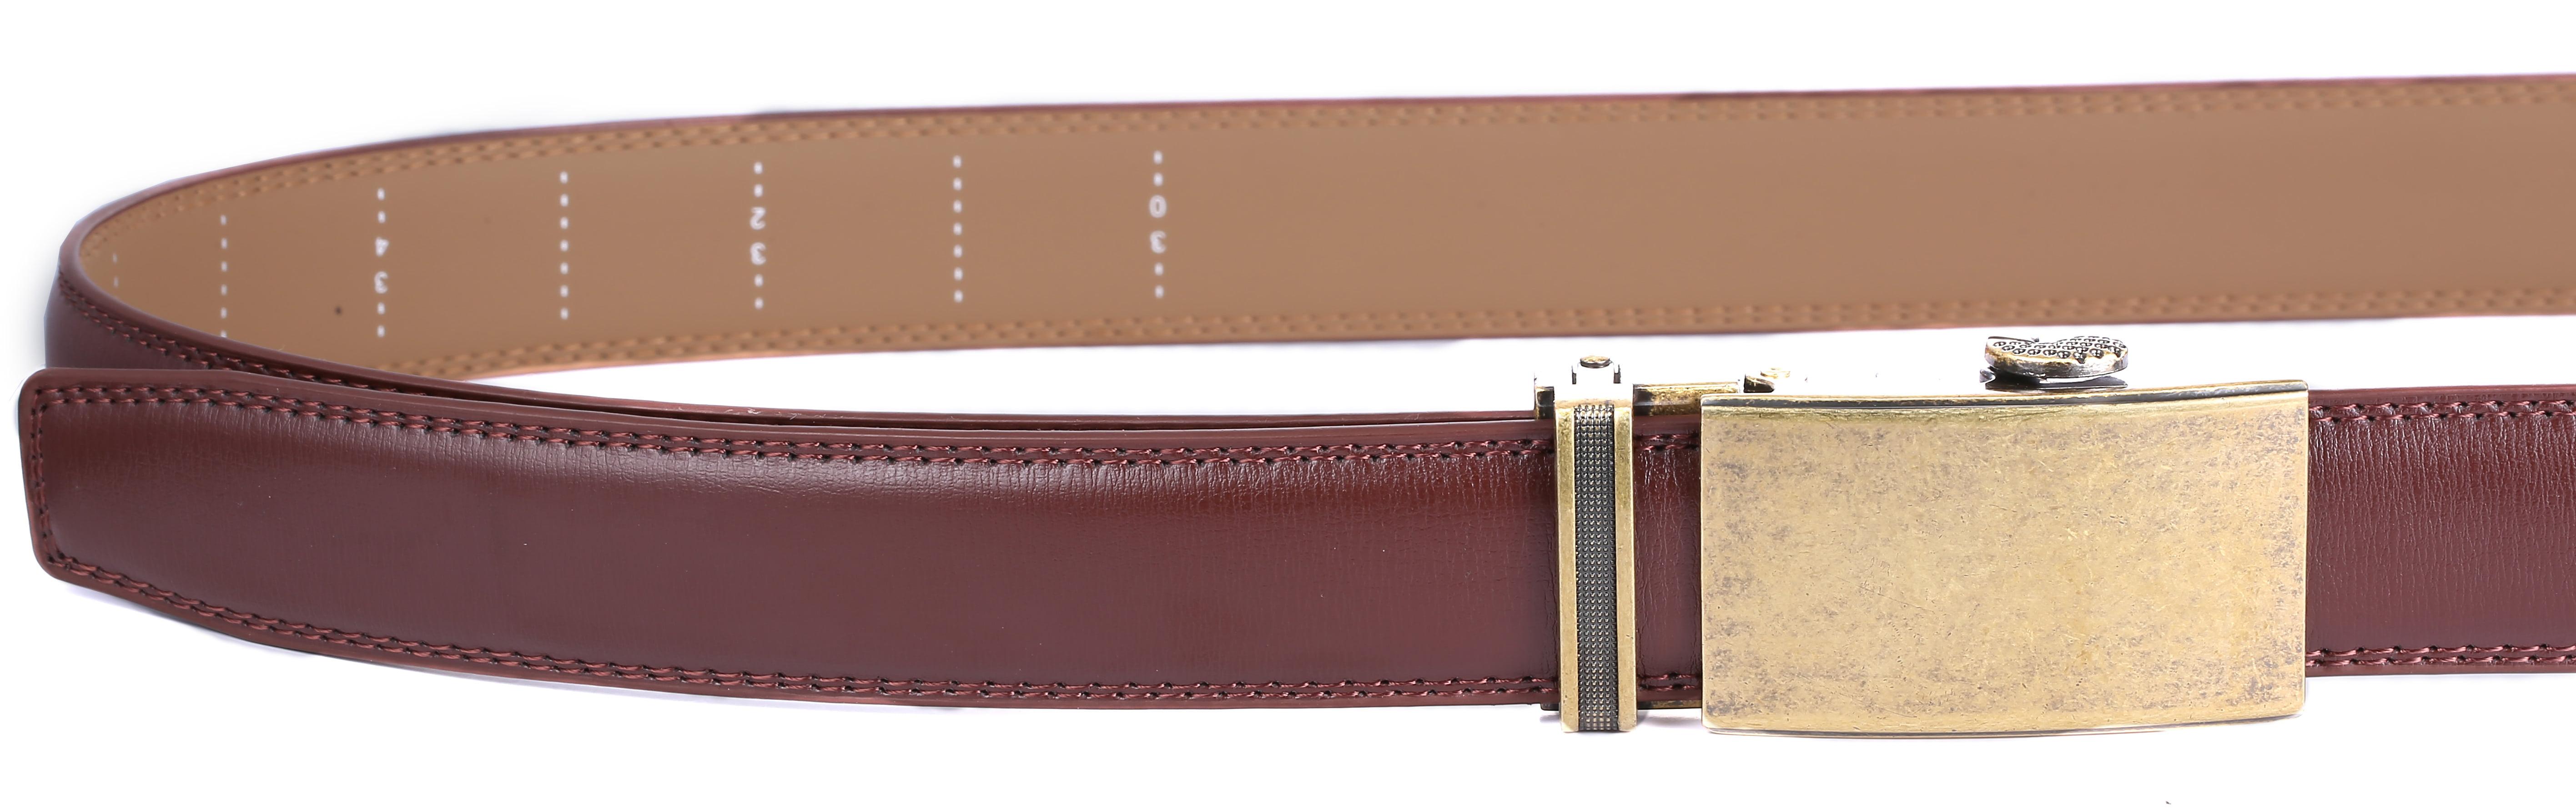 Marino Men s Genuine Leather Ratchet Dress Belt with Automatic